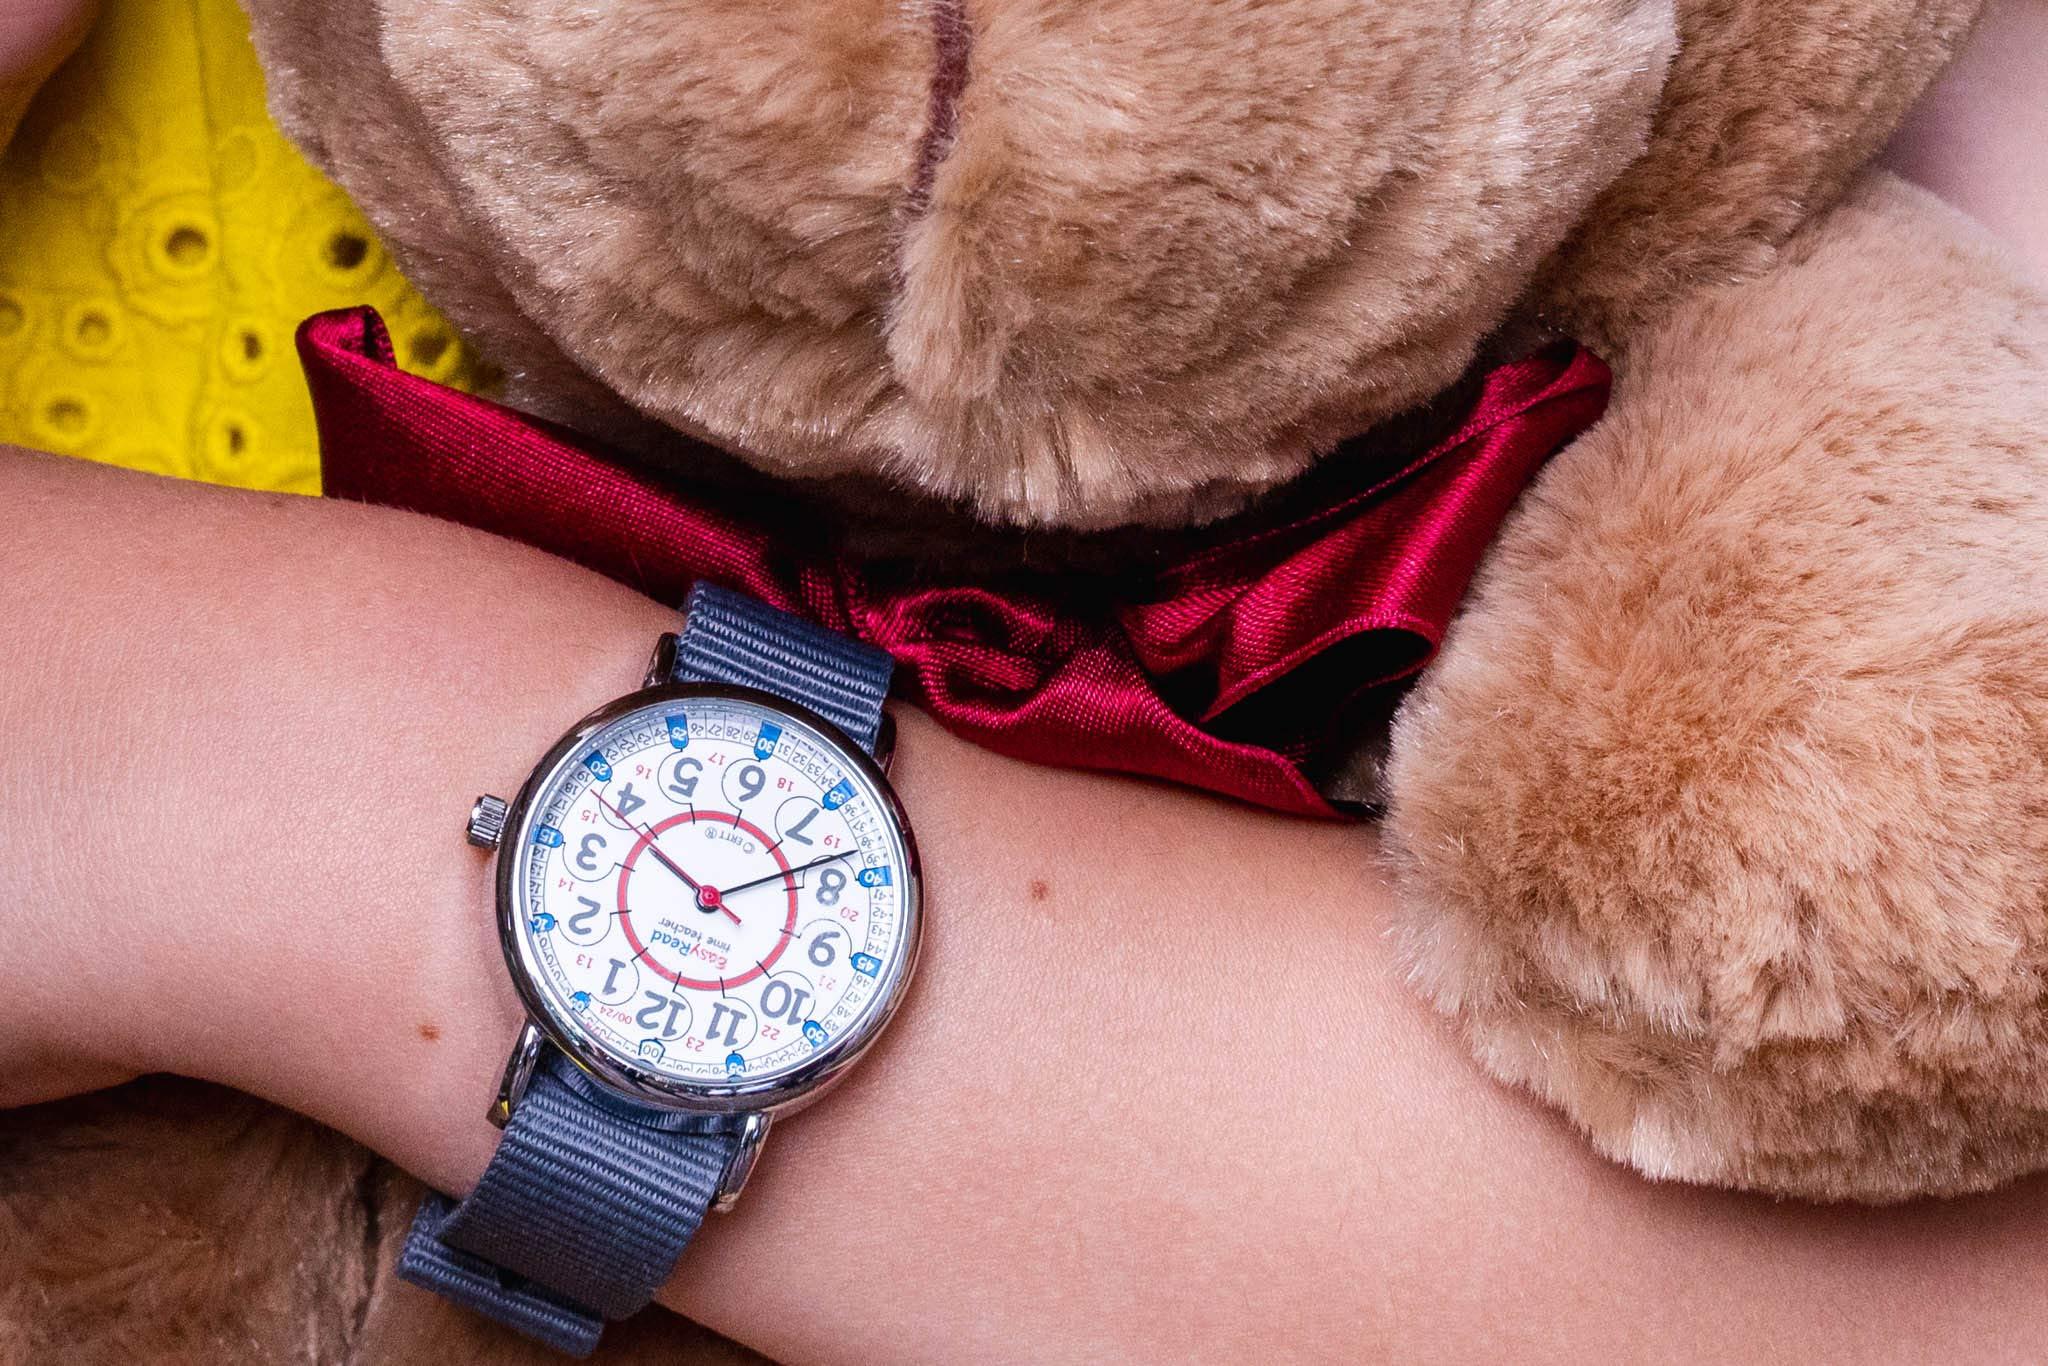 EasyRead Time Teacher Children's Watch, Red Blue 12/24 Hour Face, Grey Strap by EasyRead Time Teacher (Image #5)